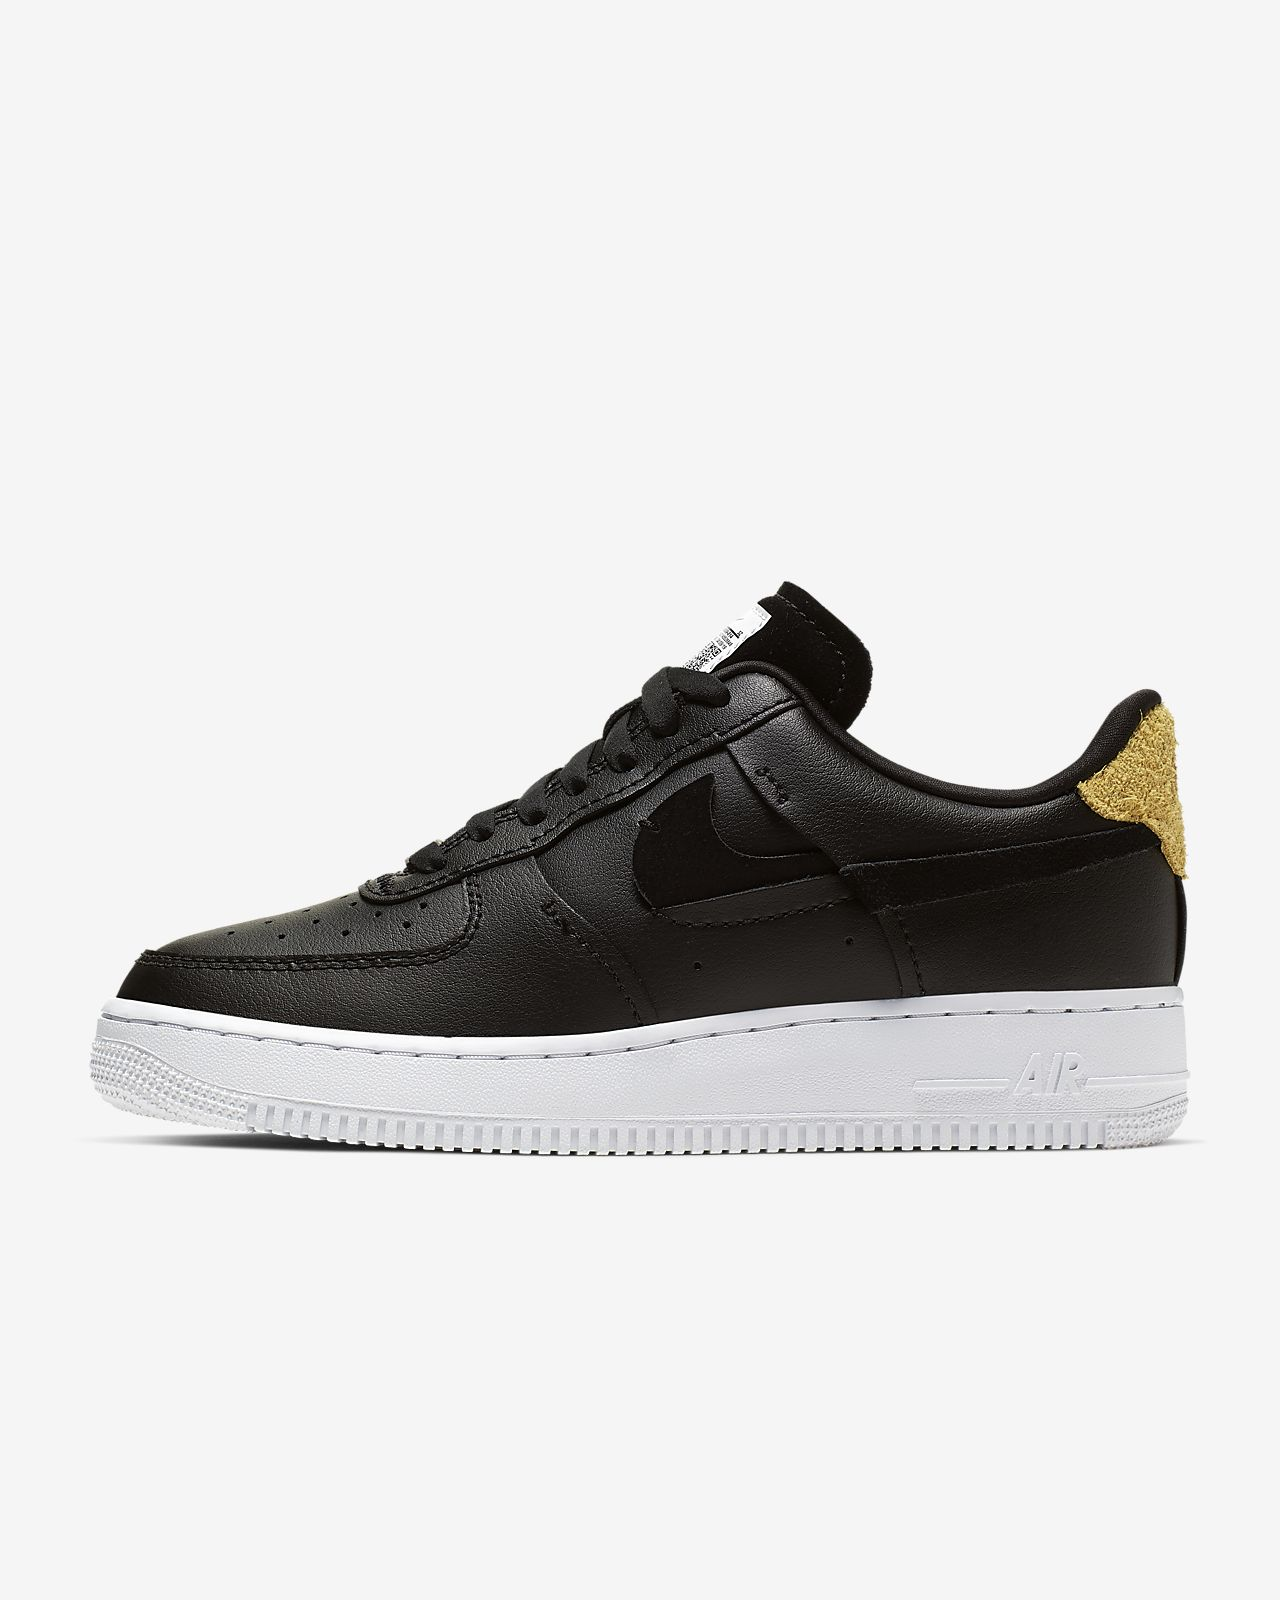 Nike Air Force 1 '07 Herren Sneakers Weiß, EU 41